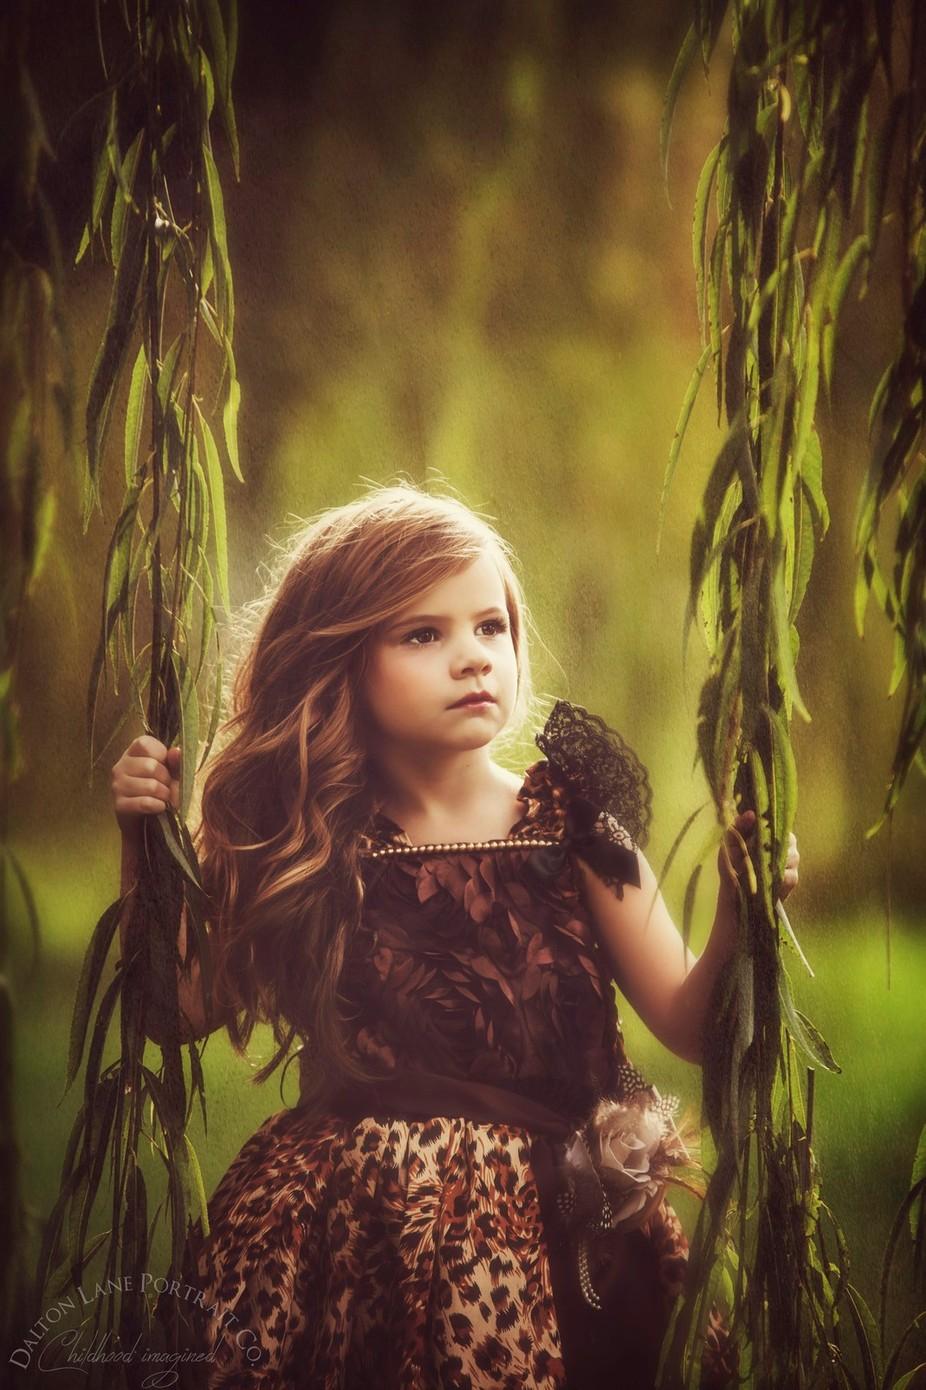 Far and Away by DaltonLanePortraitCo - Long Hair Photo Contest